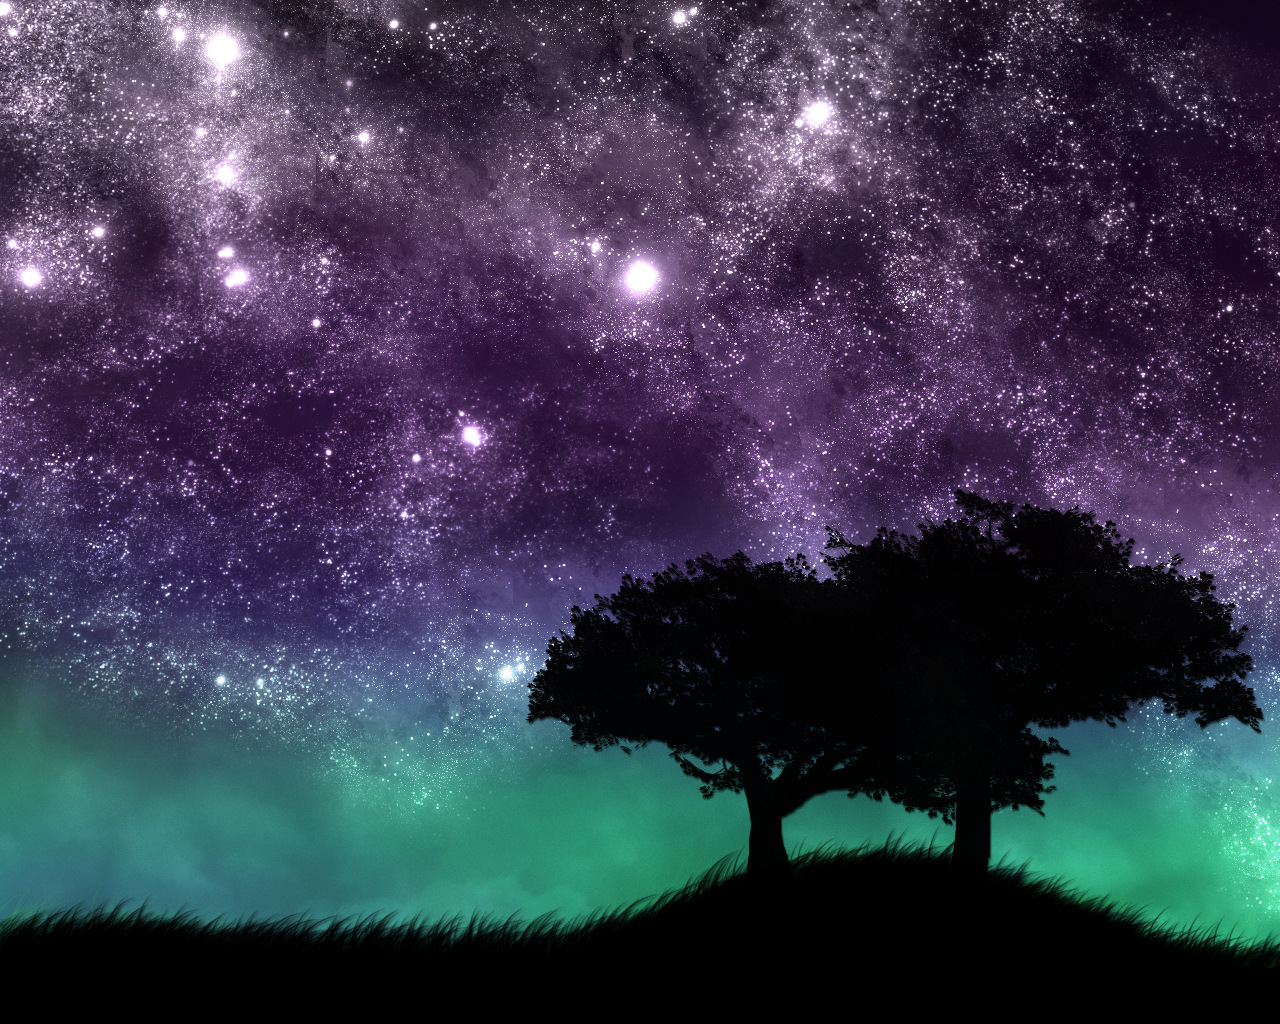 Звездное небо 3d обои